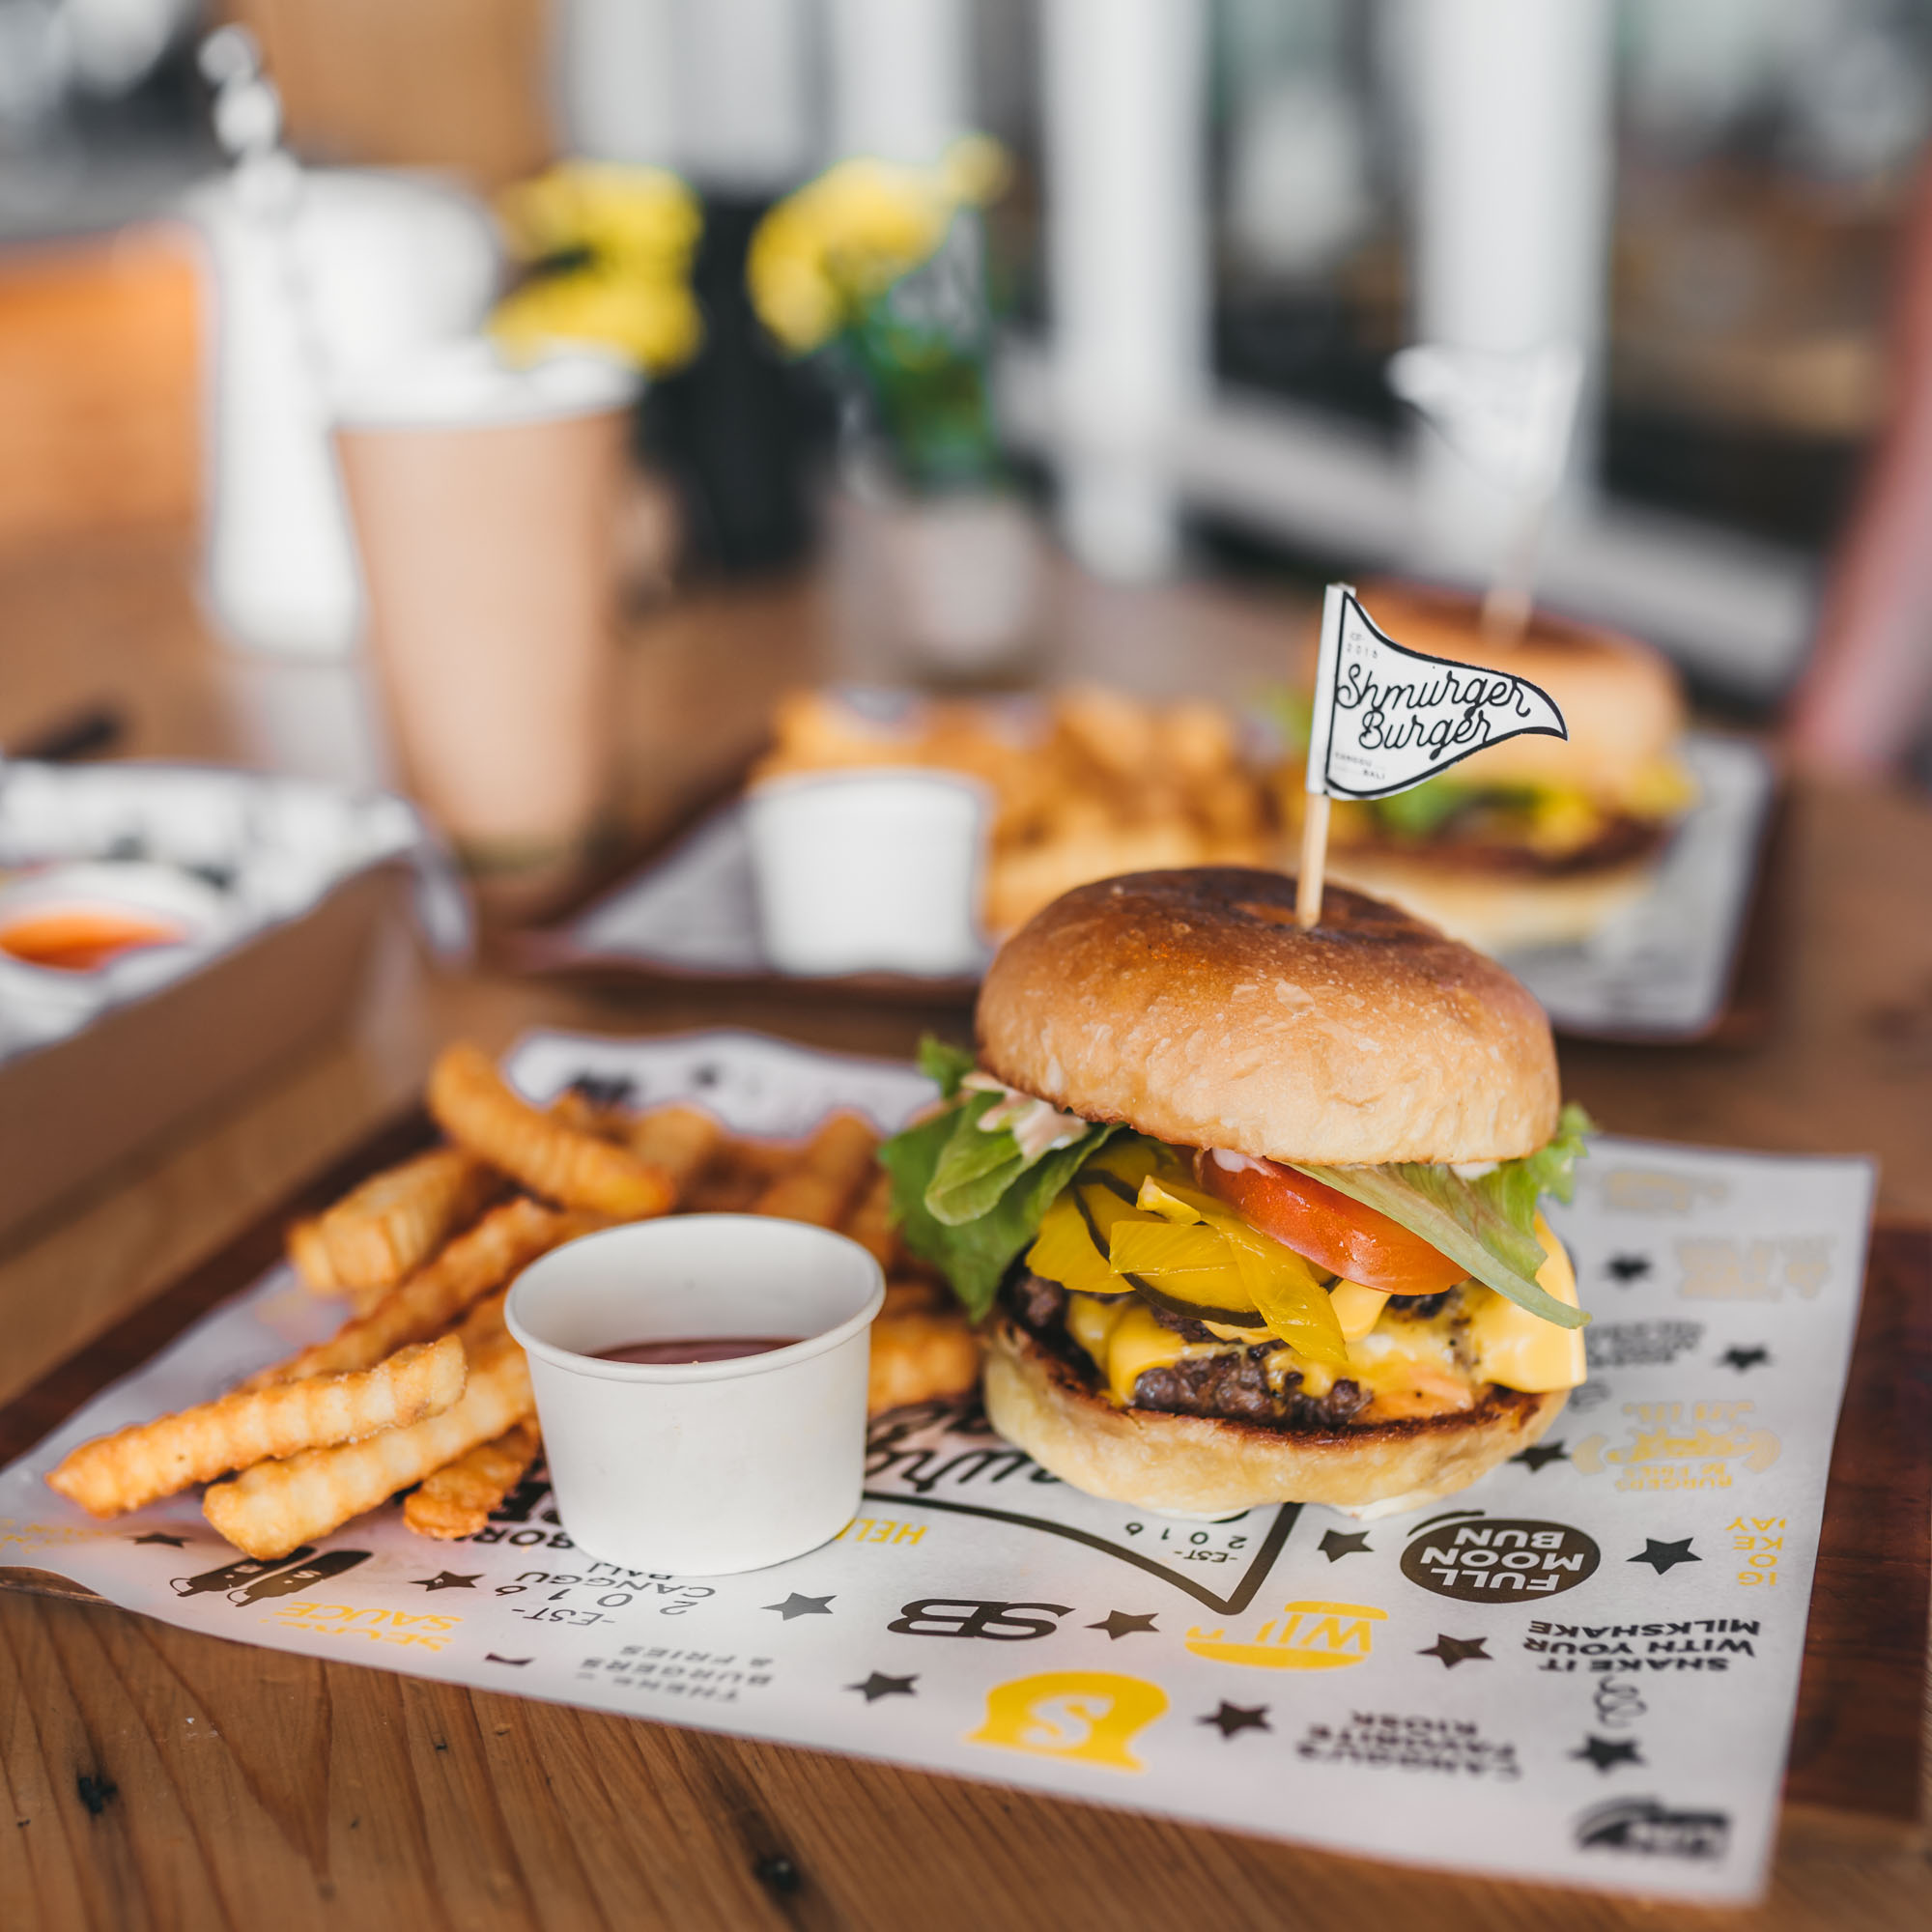 keira-mason-shmurger-burger-beef-burger.jpg